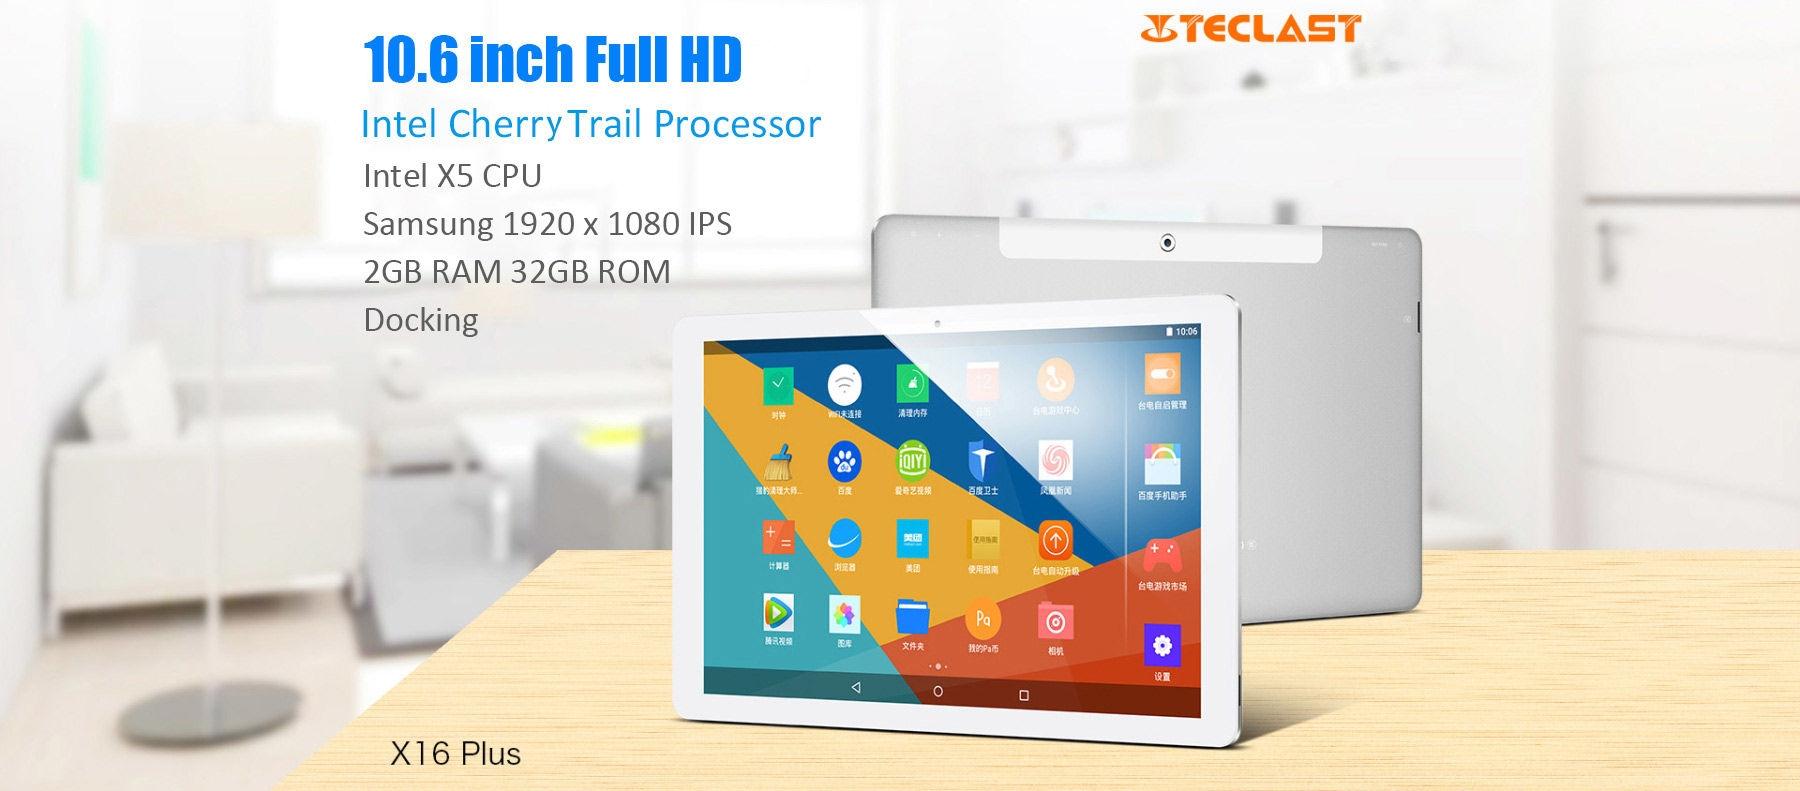 Teclast X16 Plus 10.6 inch Android 5.1 2 in 1 Tablet PC Intel Cherry Trail Z8300 64bit Quad Core 1.44GHz IPS Screen 2GB RAM 32GB ROM Bluetooth 4.0